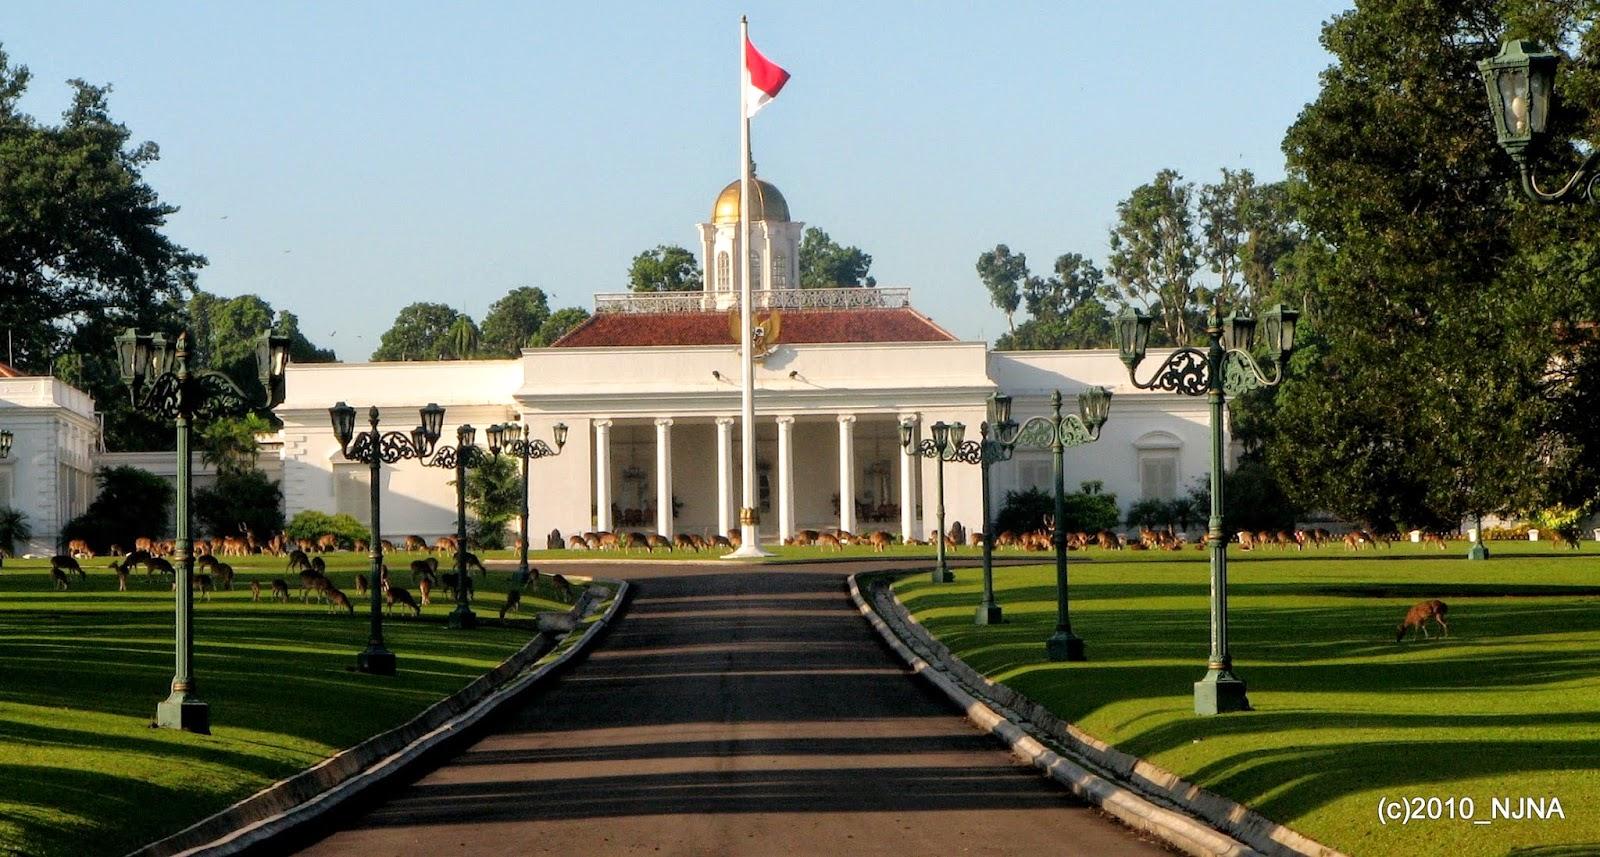 Bogor Indonesia  city photos : Foto Istana Indonesia, Negara, Bogor, Tampak Siring, Merdeka, Cipanas ...